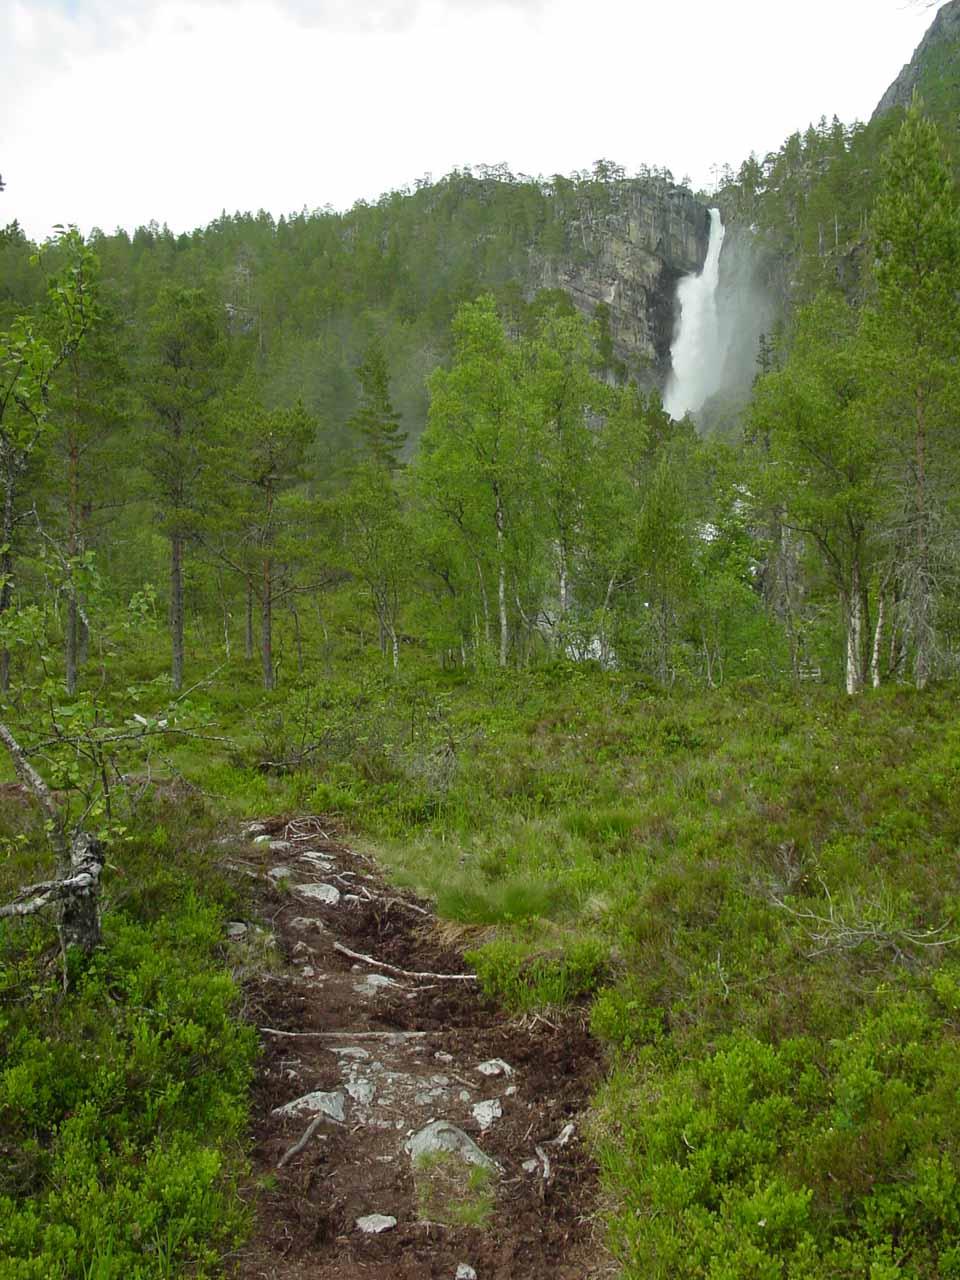 Getting closer to Nauståfossen on the muddy trail